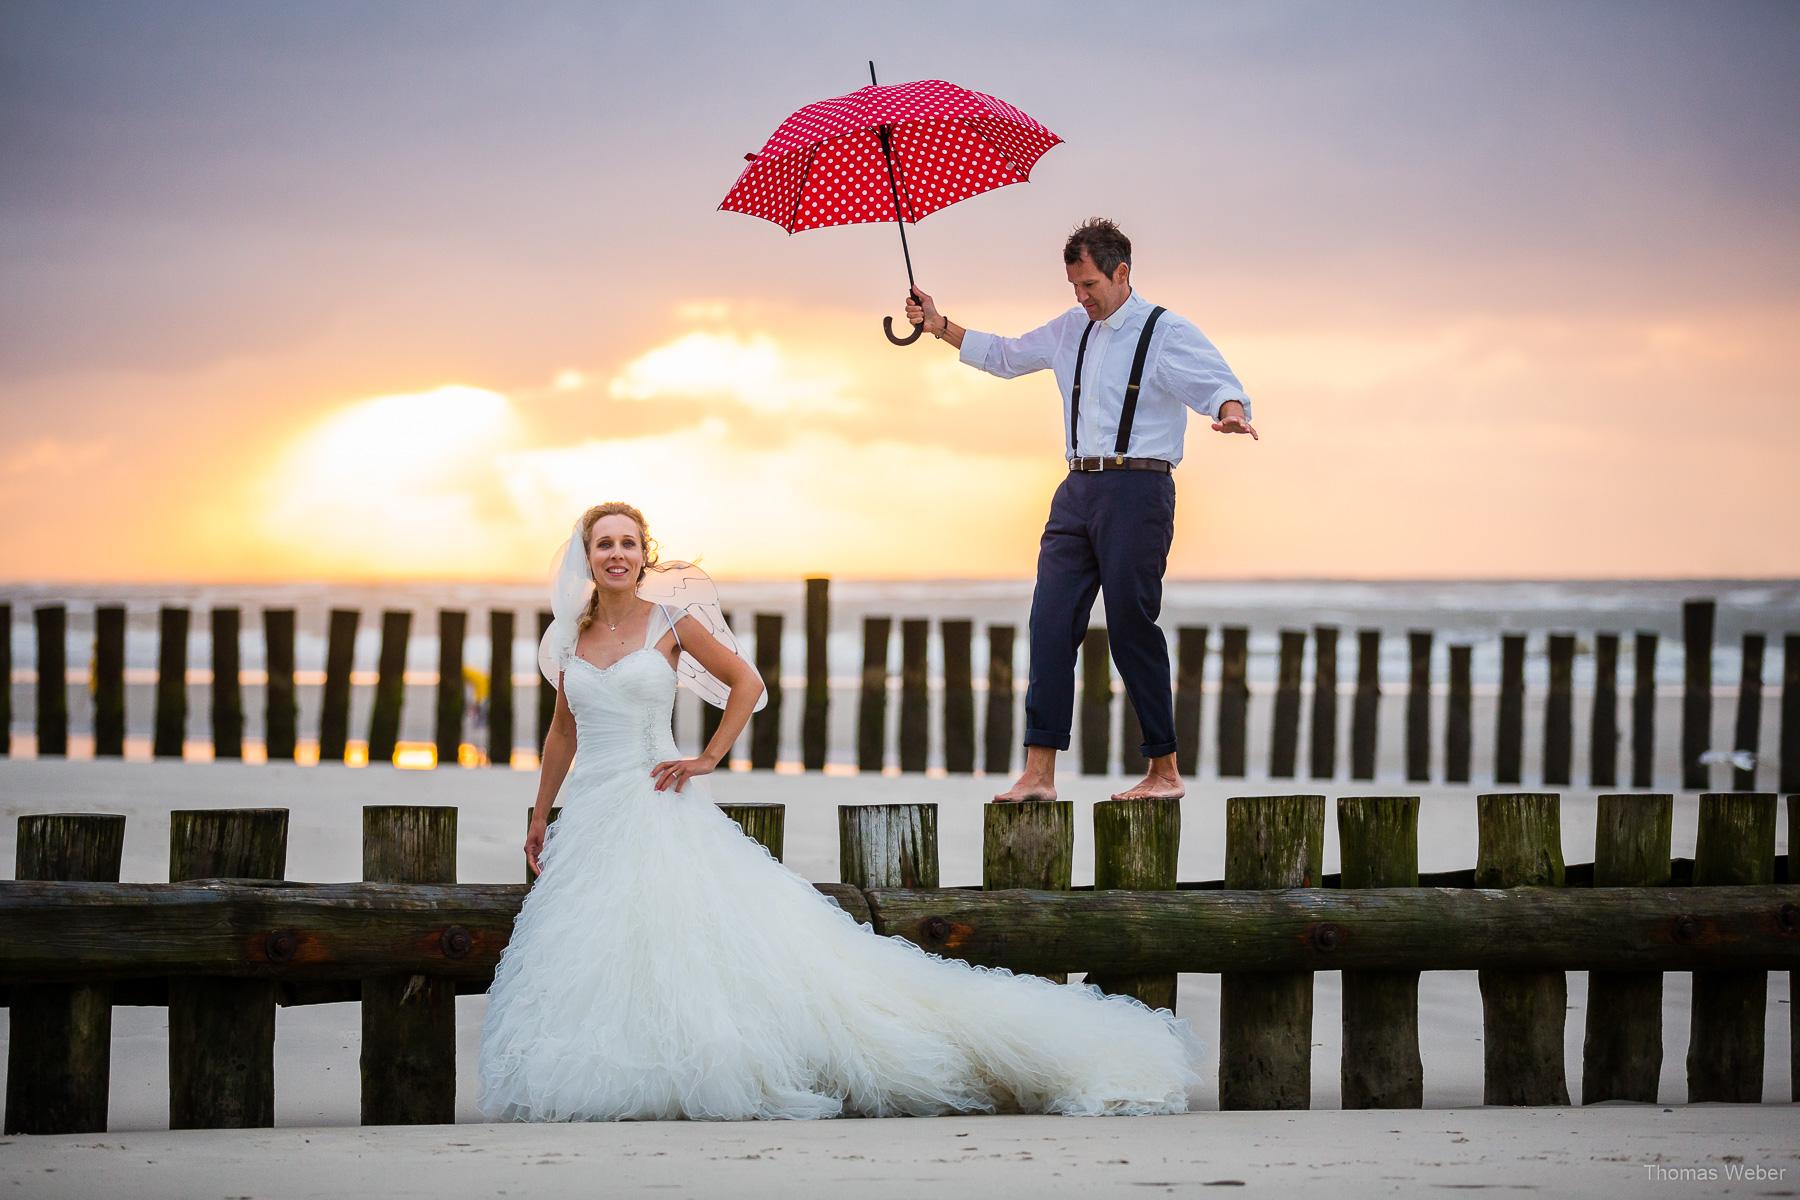 After-Wedding-Shooting auf Wangerooge, Fotograf Thomas Weber aus Oldenburg